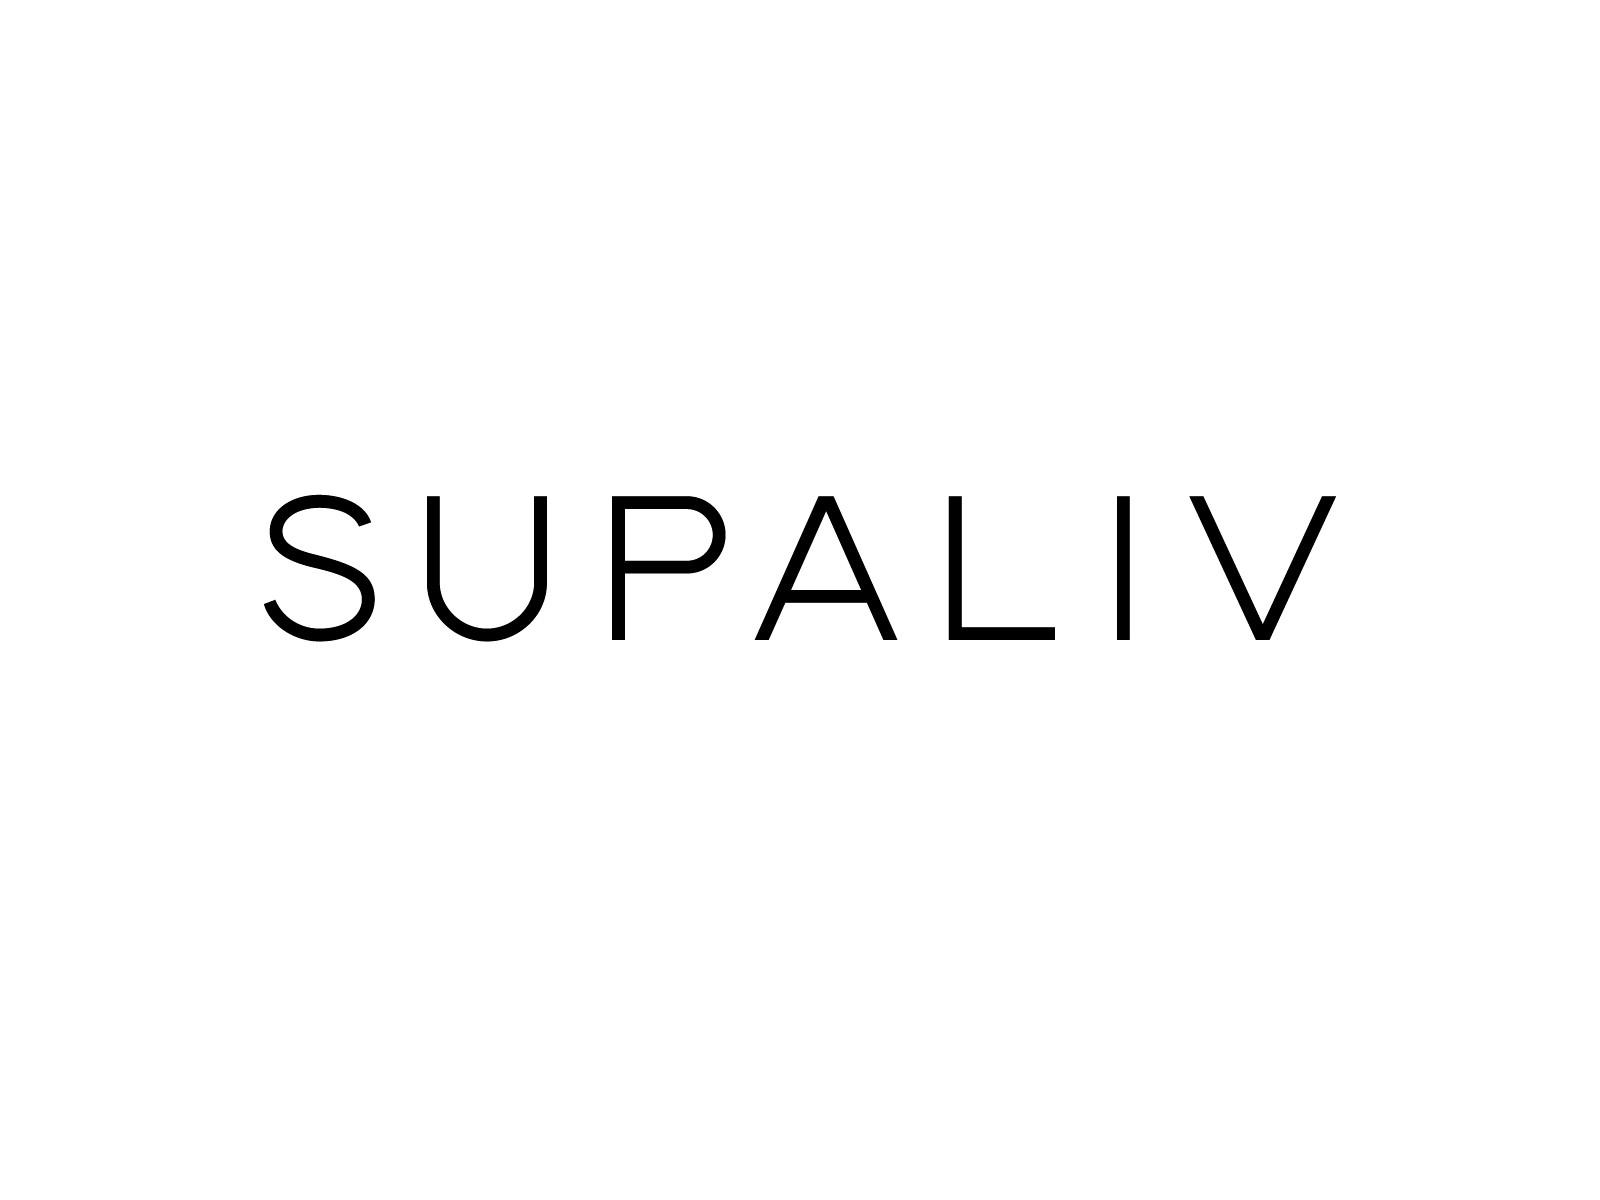 works_supaliv_logo_01